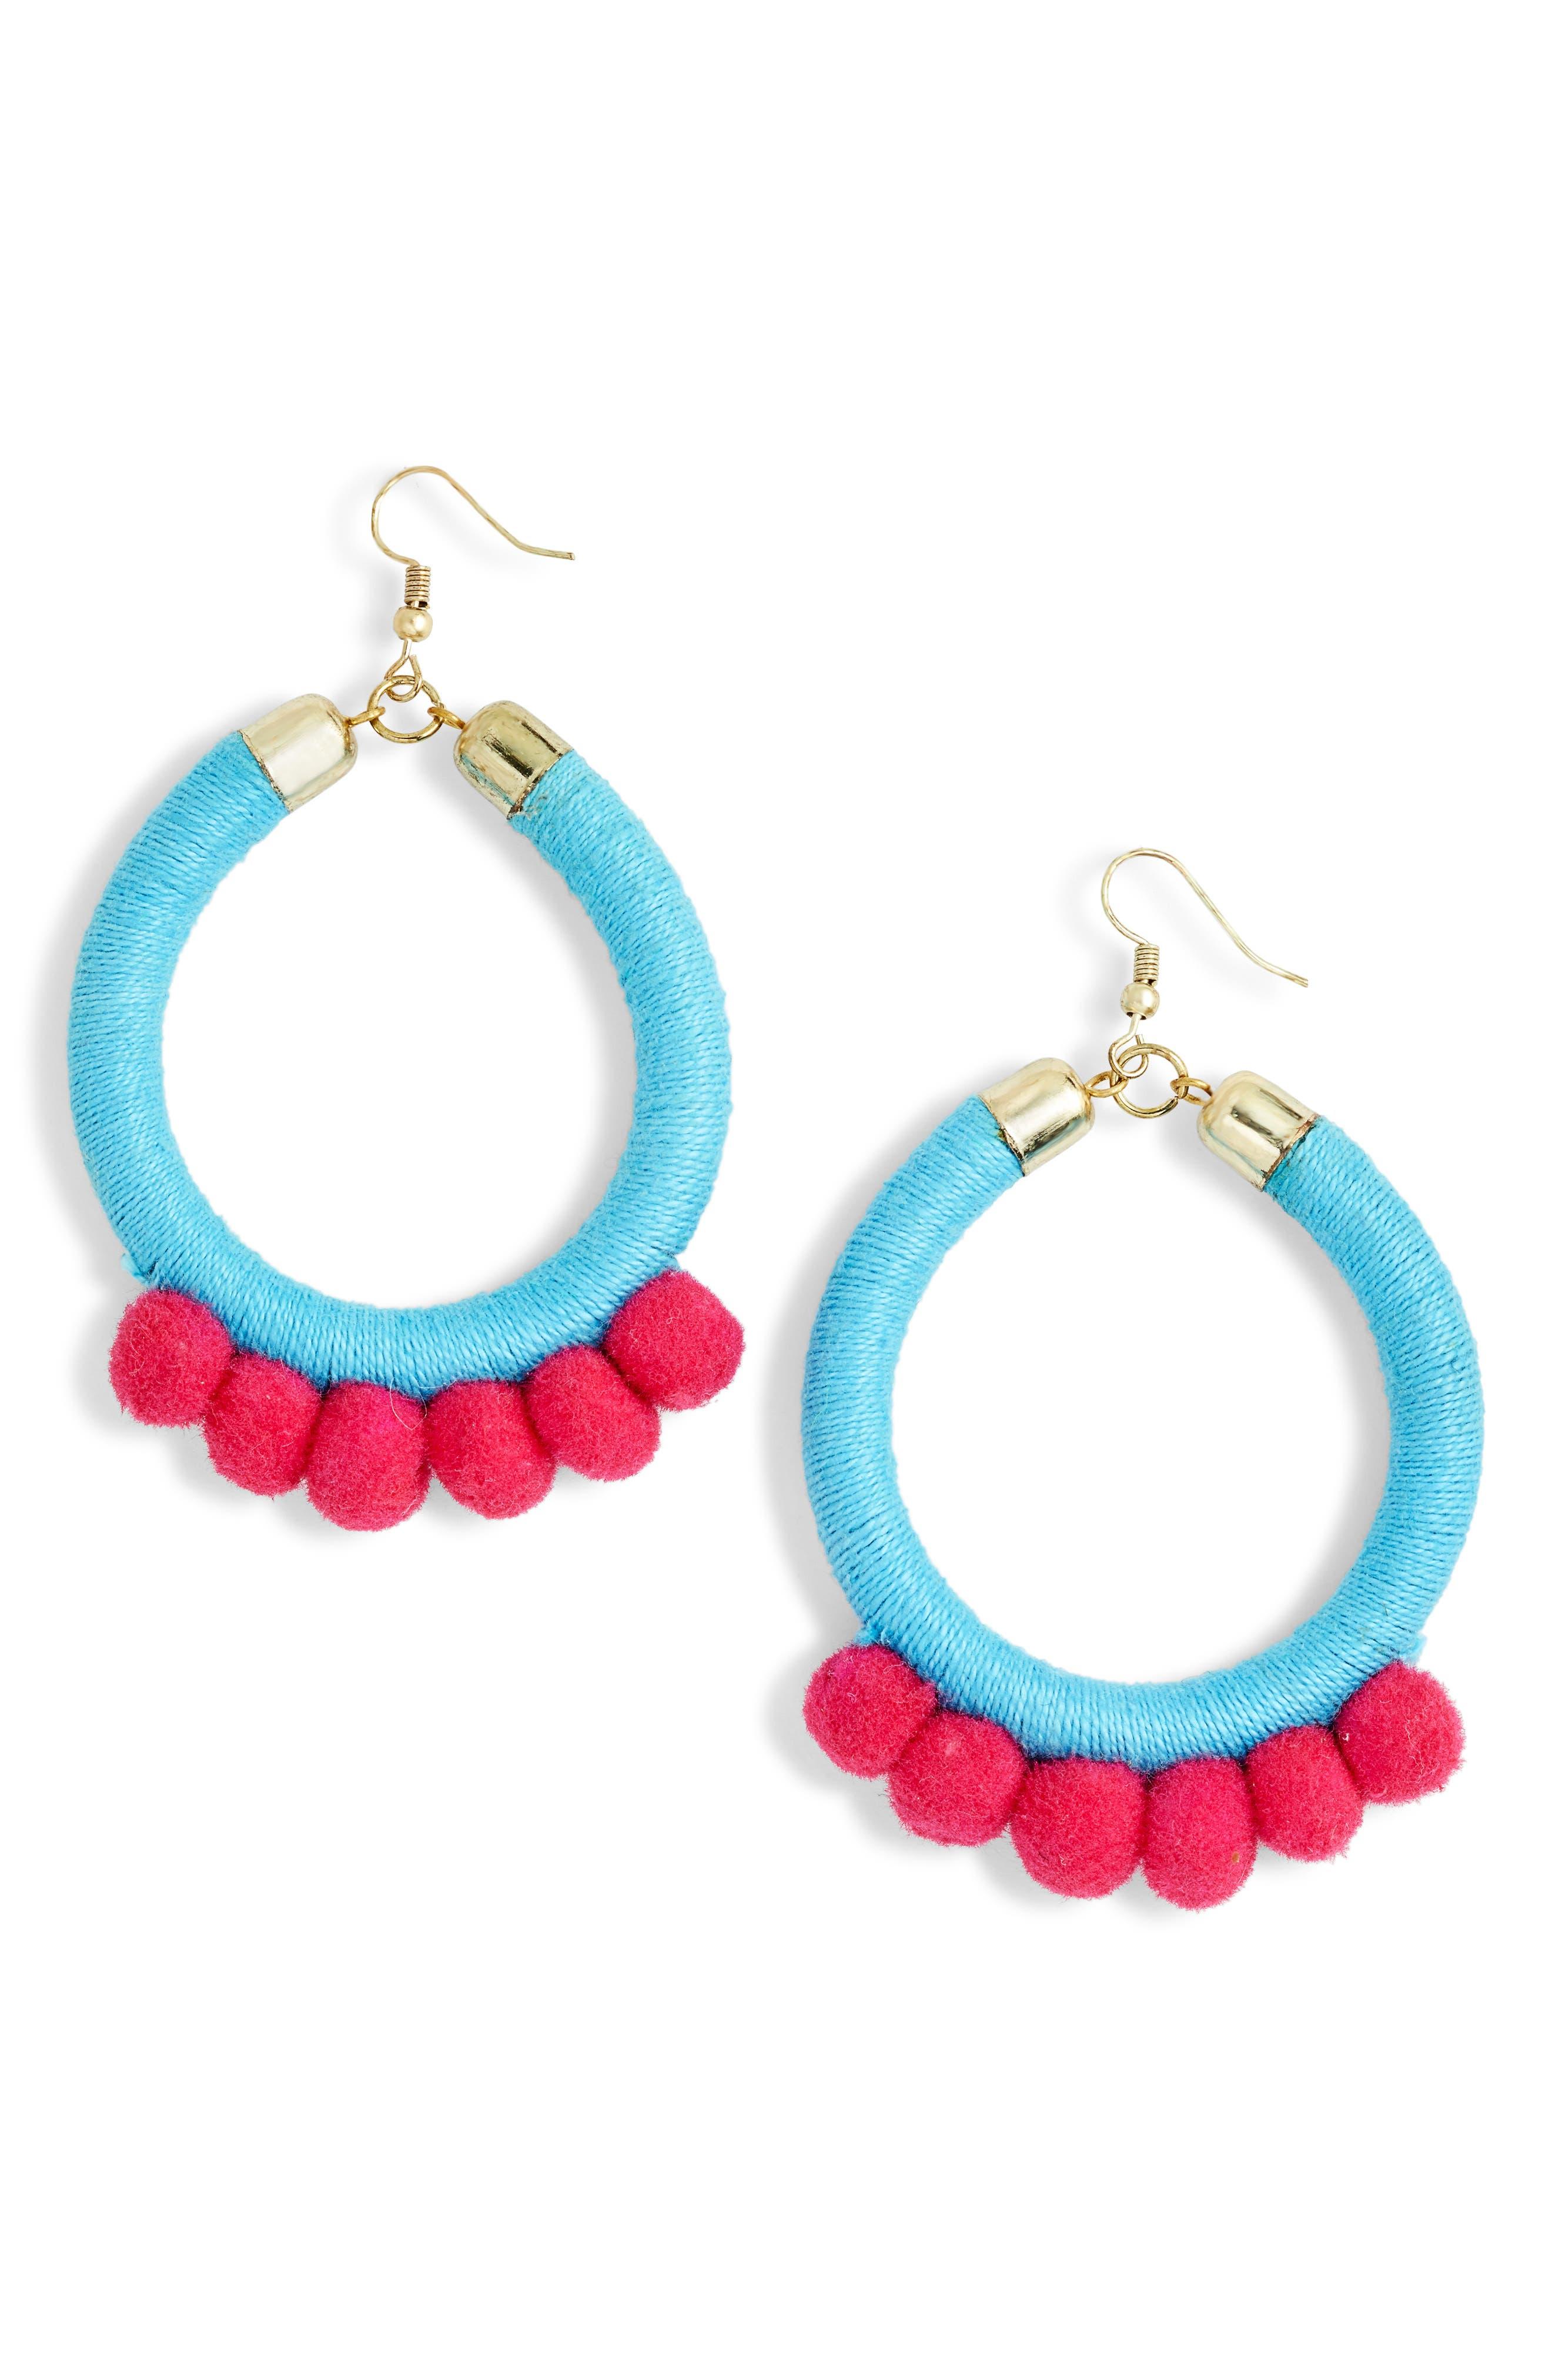 Lauren Pom Hoop Earrings,                             Main thumbnail 1, color,                             Turquoise/ Fuschia